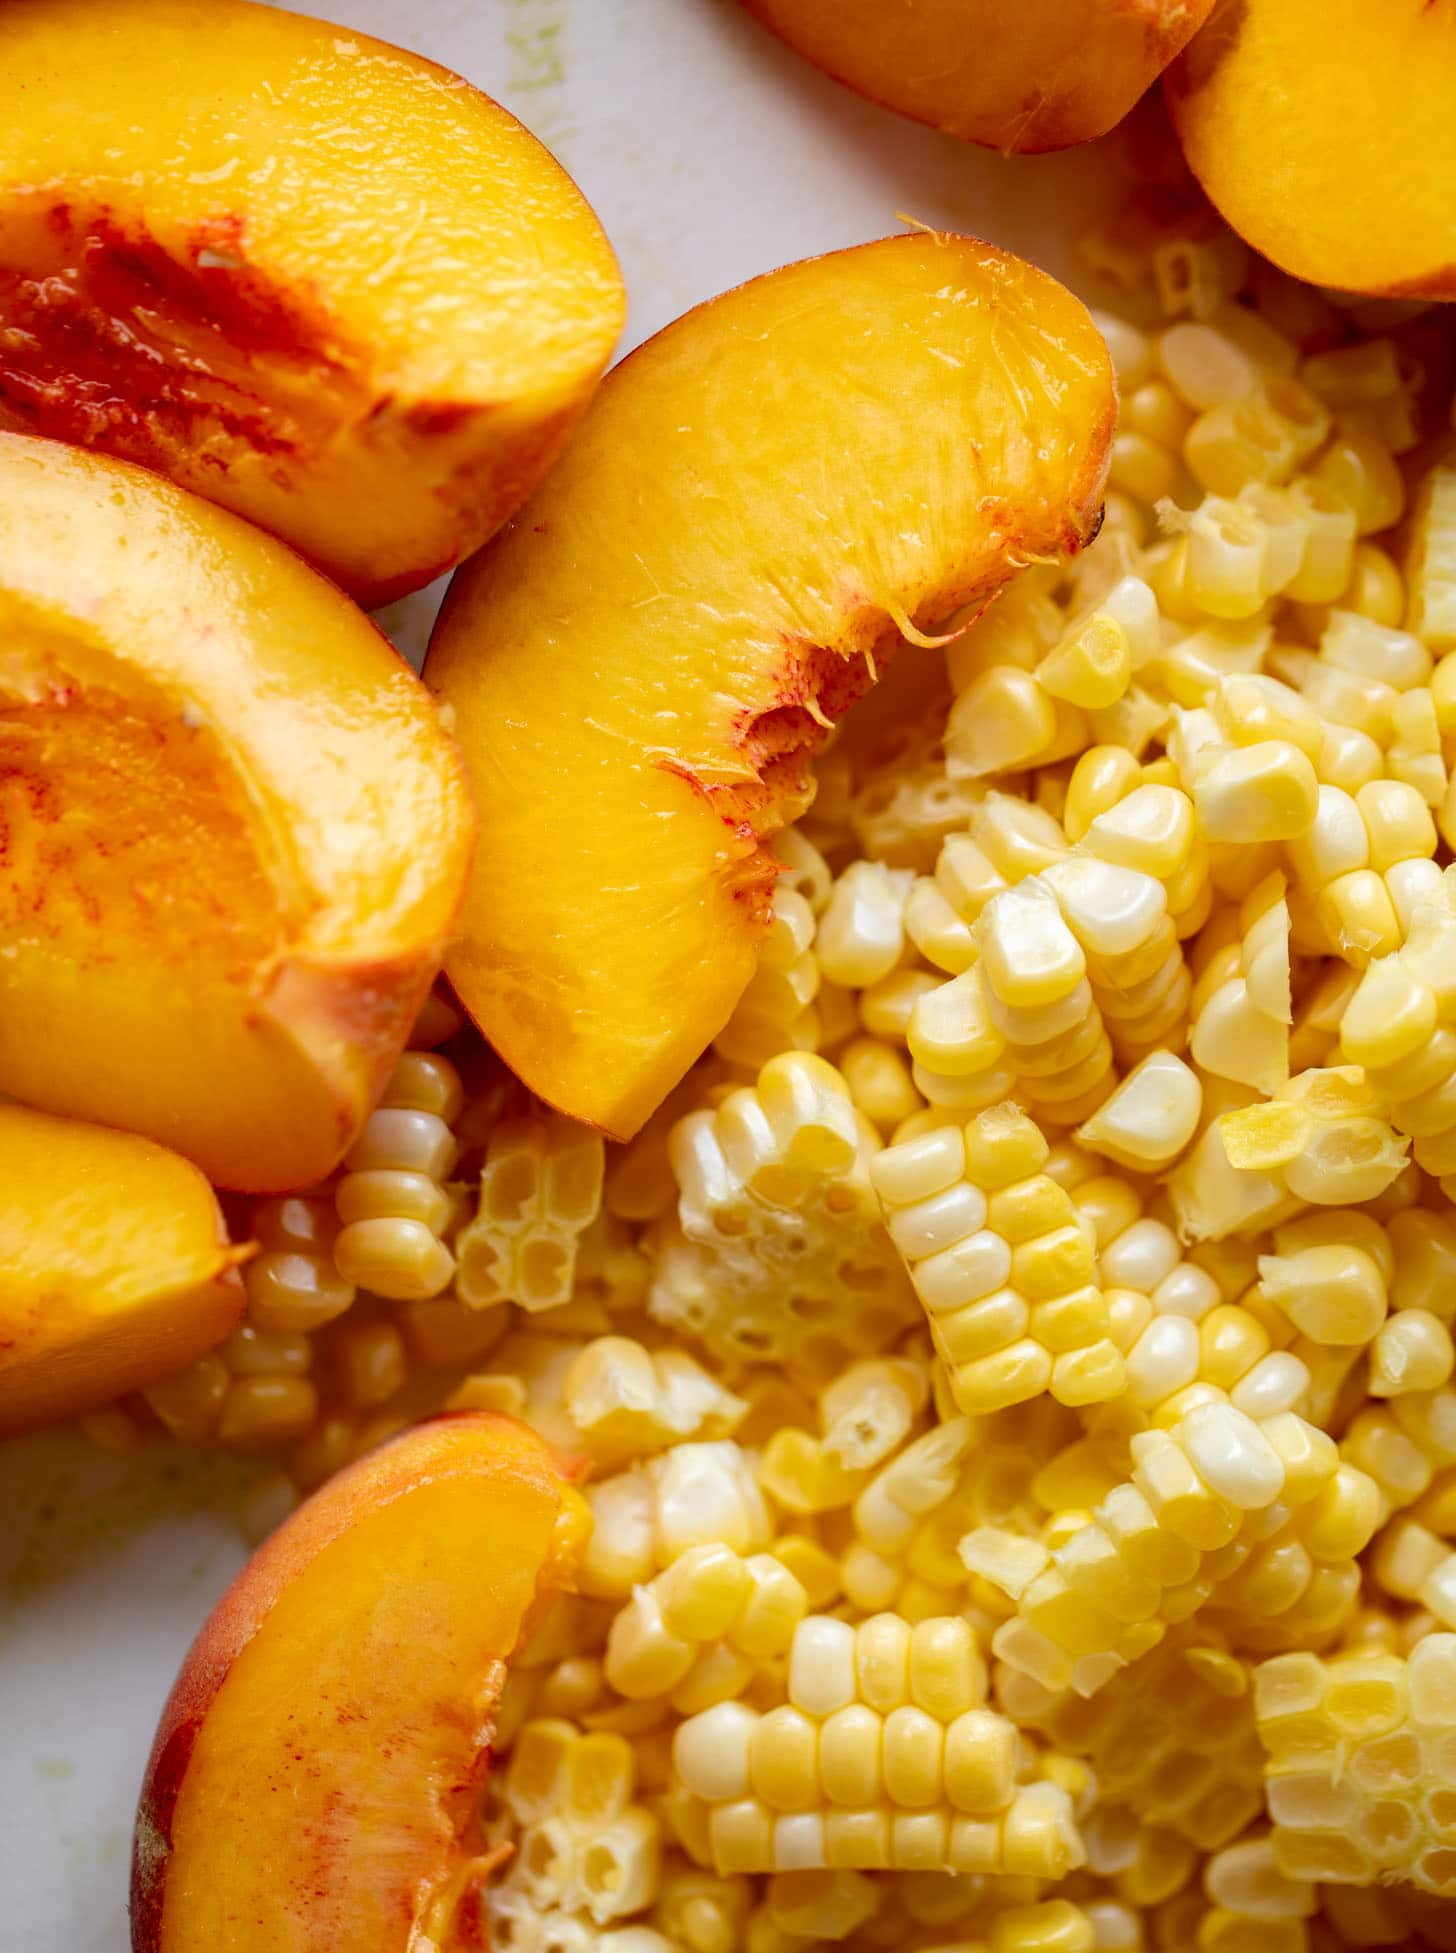 corn and peaches